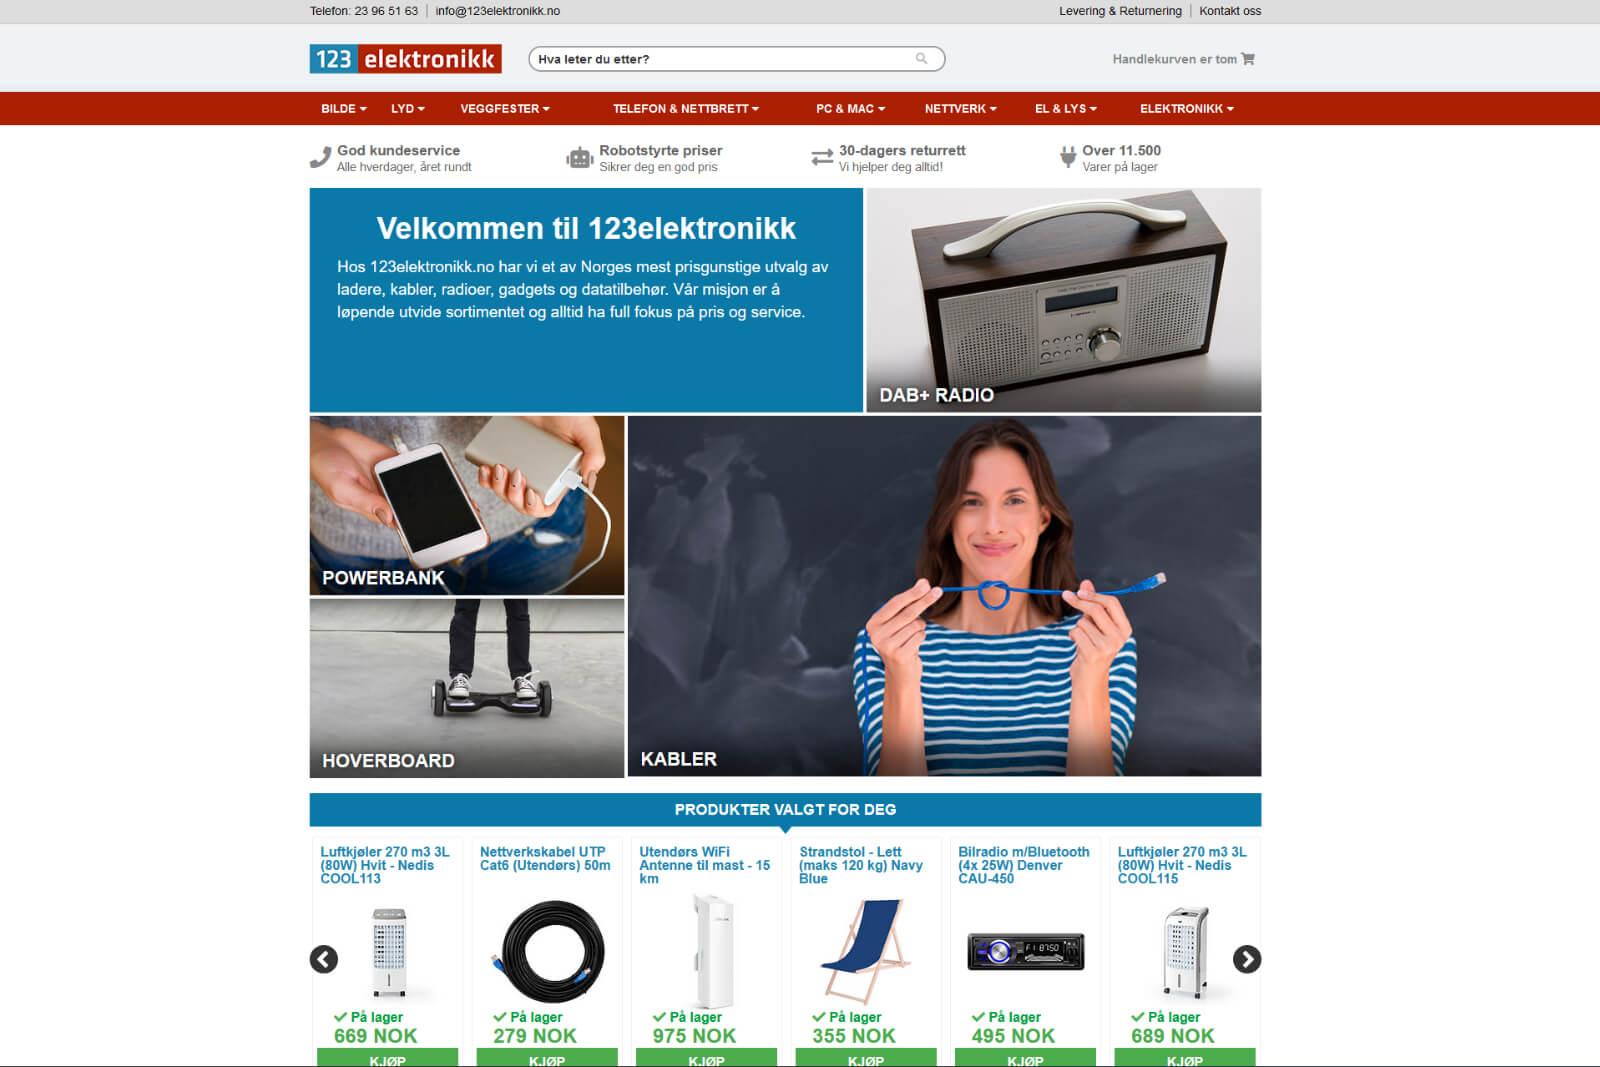 123elektrnonikk websider